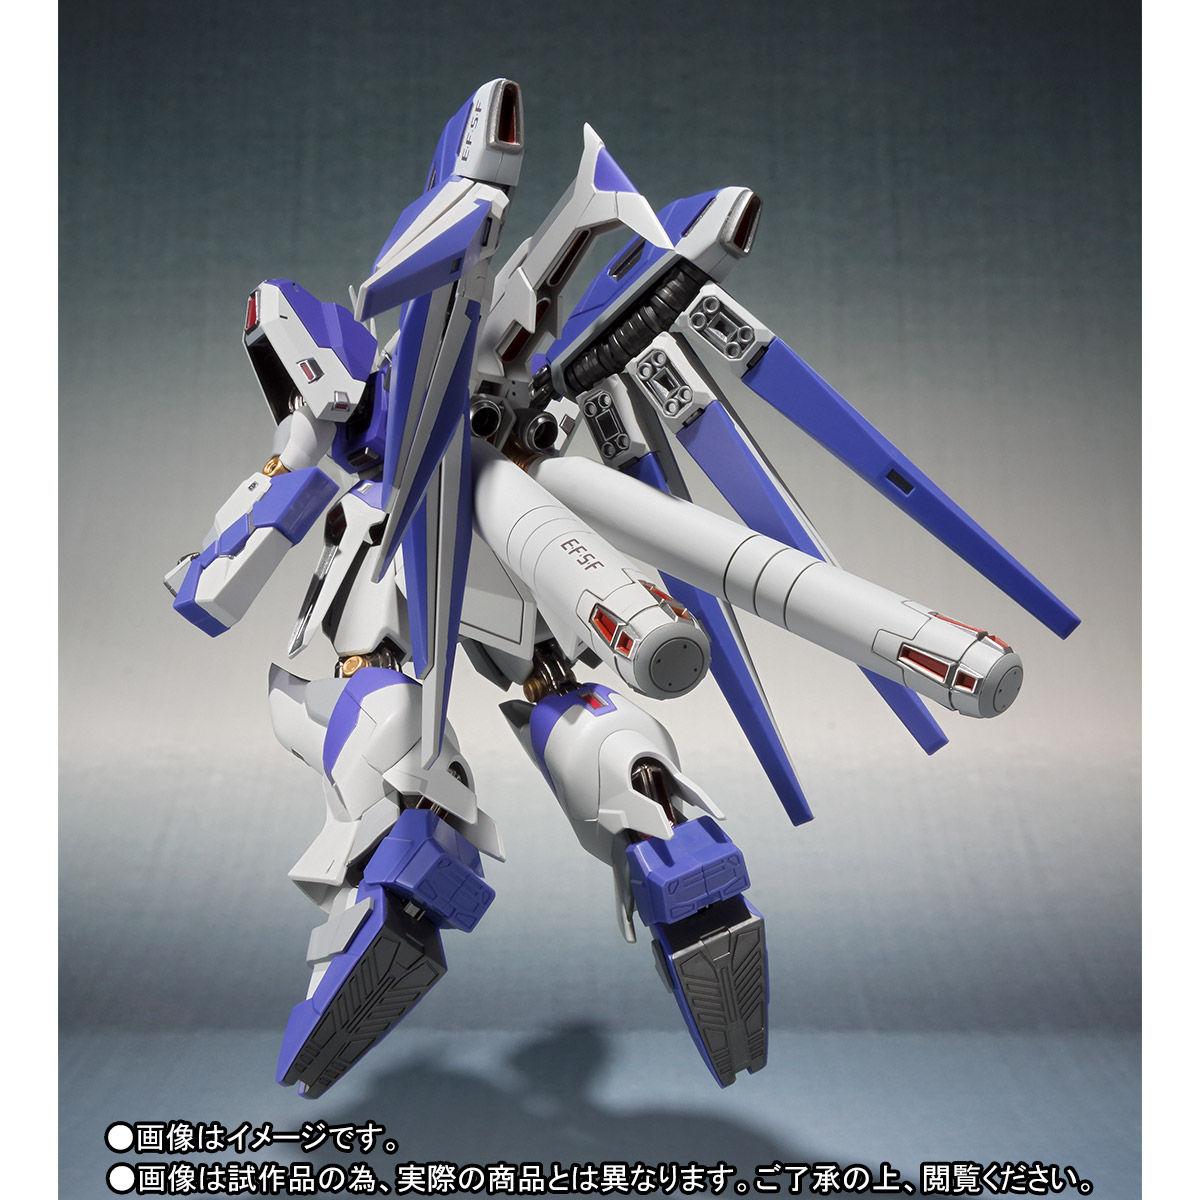 METAL ROBOT魂〈SIDE MS〉『Hi-νガンダム』逆襲のシャア 可動フィギュア-003